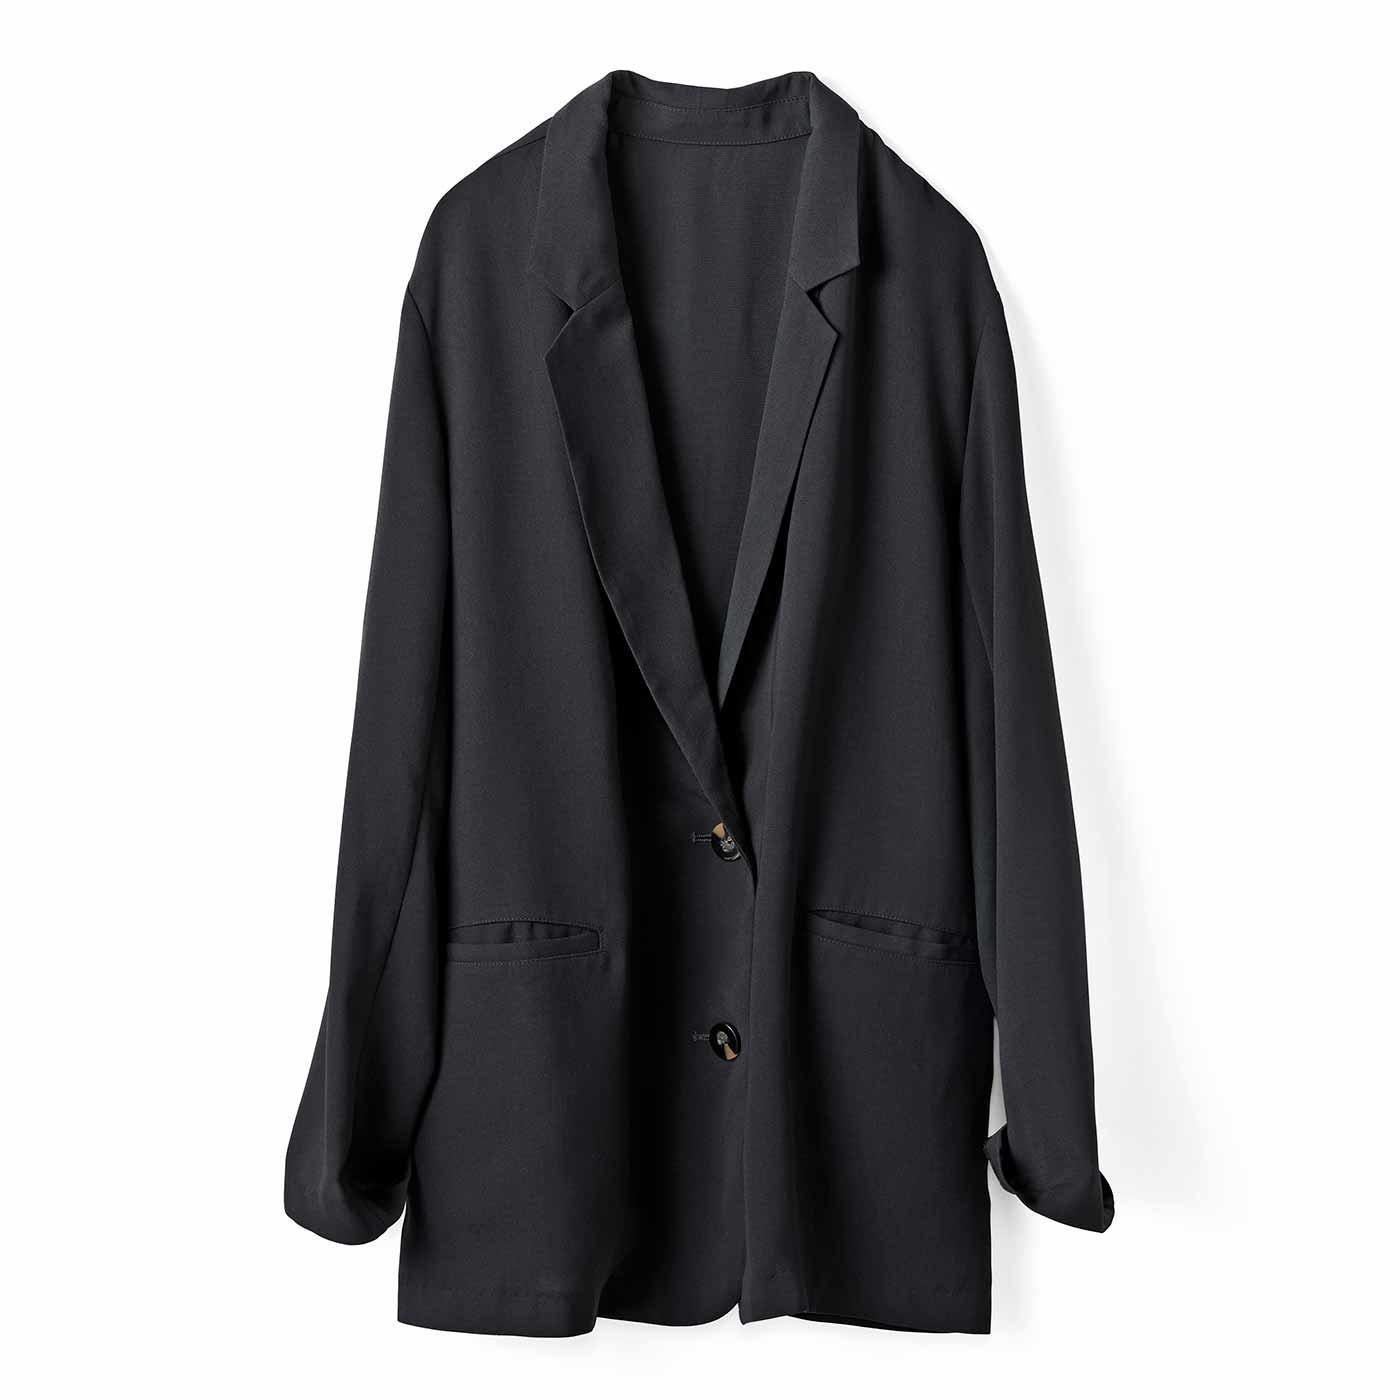 IEDIT[イディット] 接触冷感でサラリと着られる 軽やかジャケット〈ブラック〉